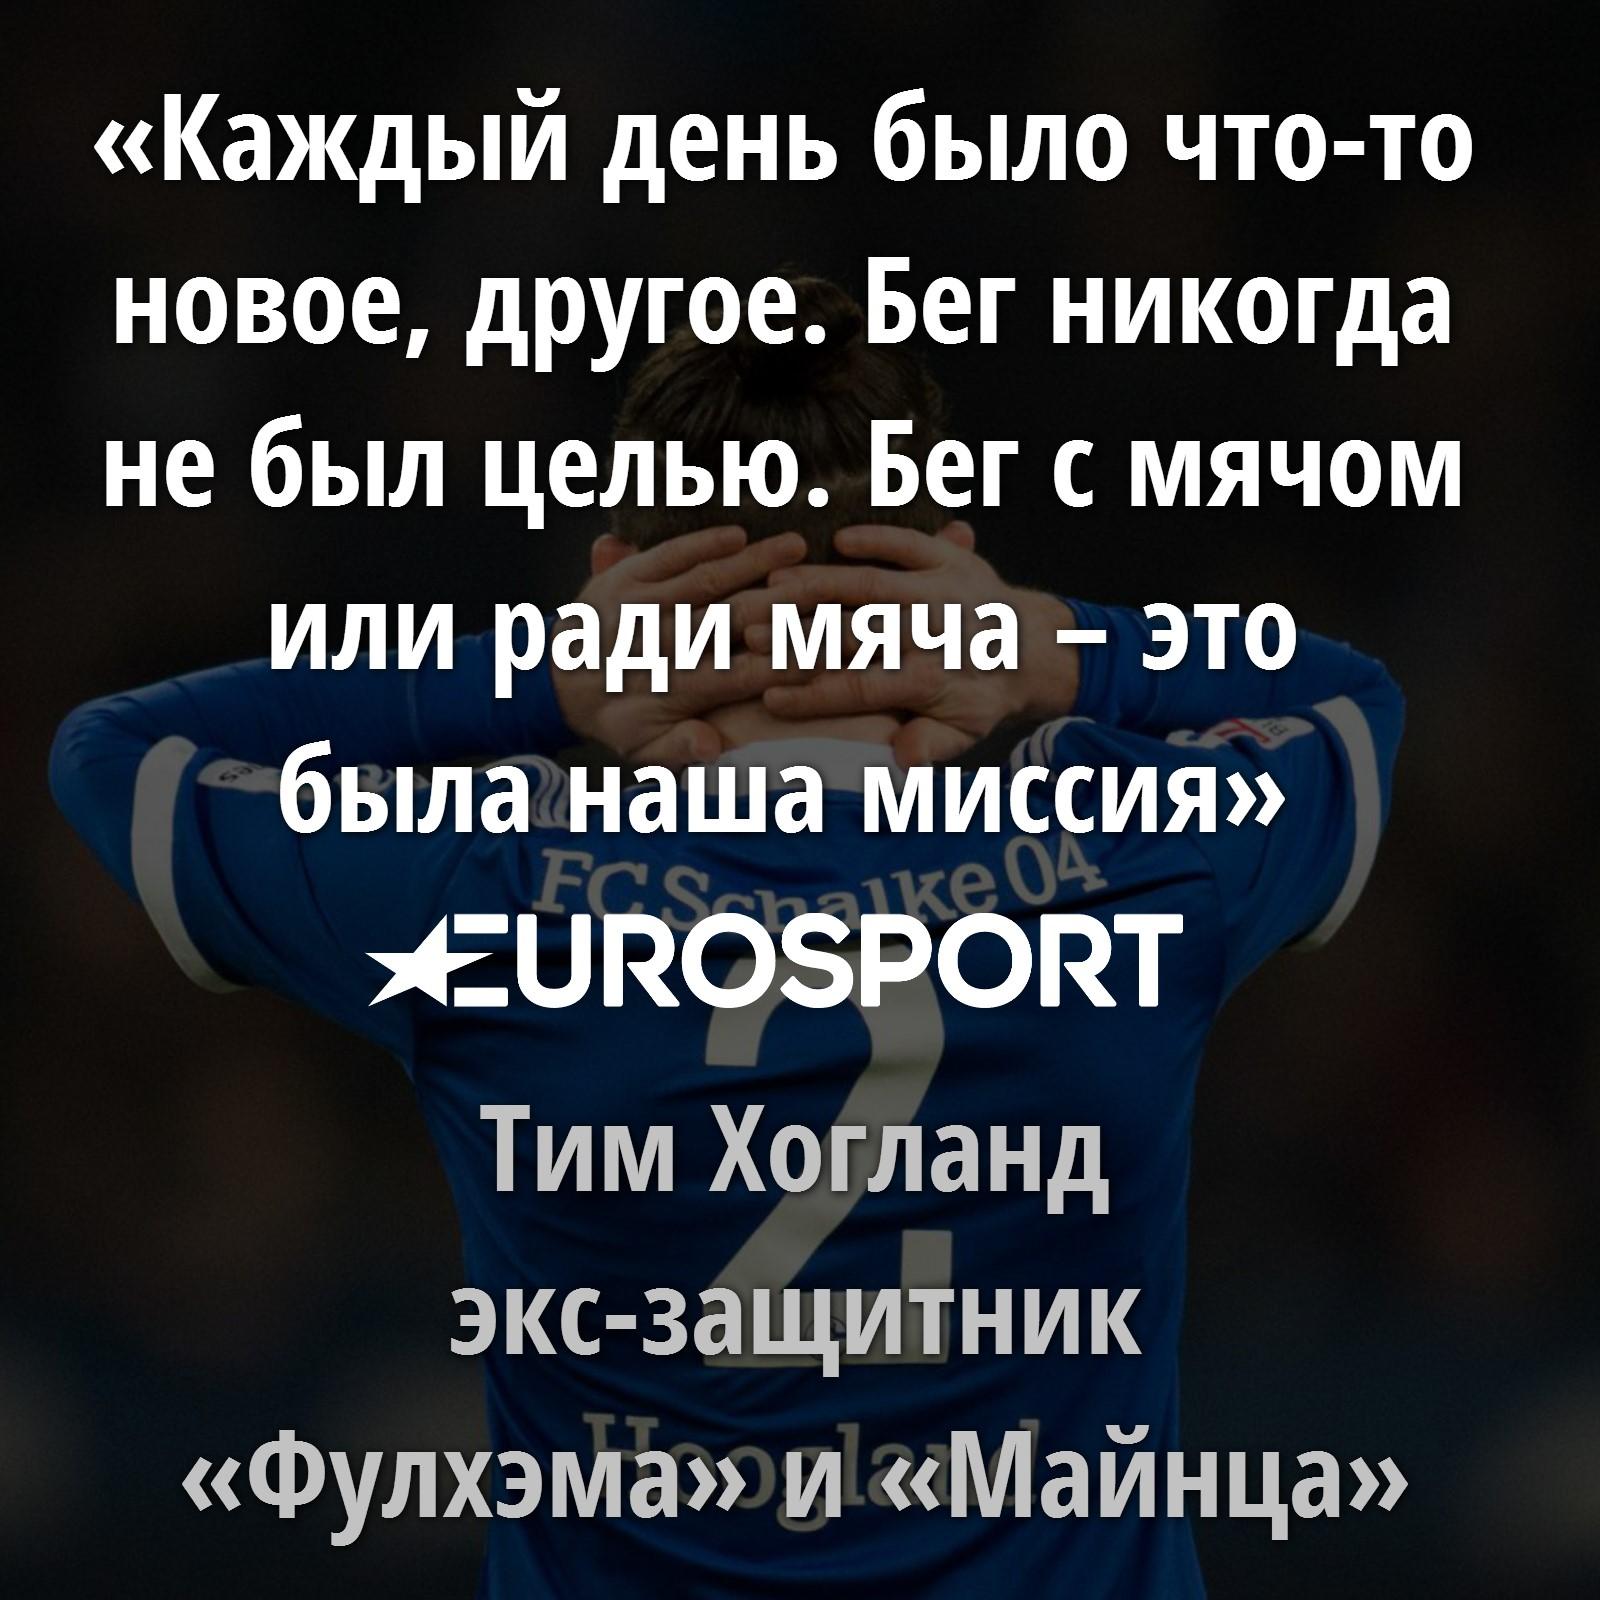 https://i.eurosport.com/2015/11/19/1735228.jpg